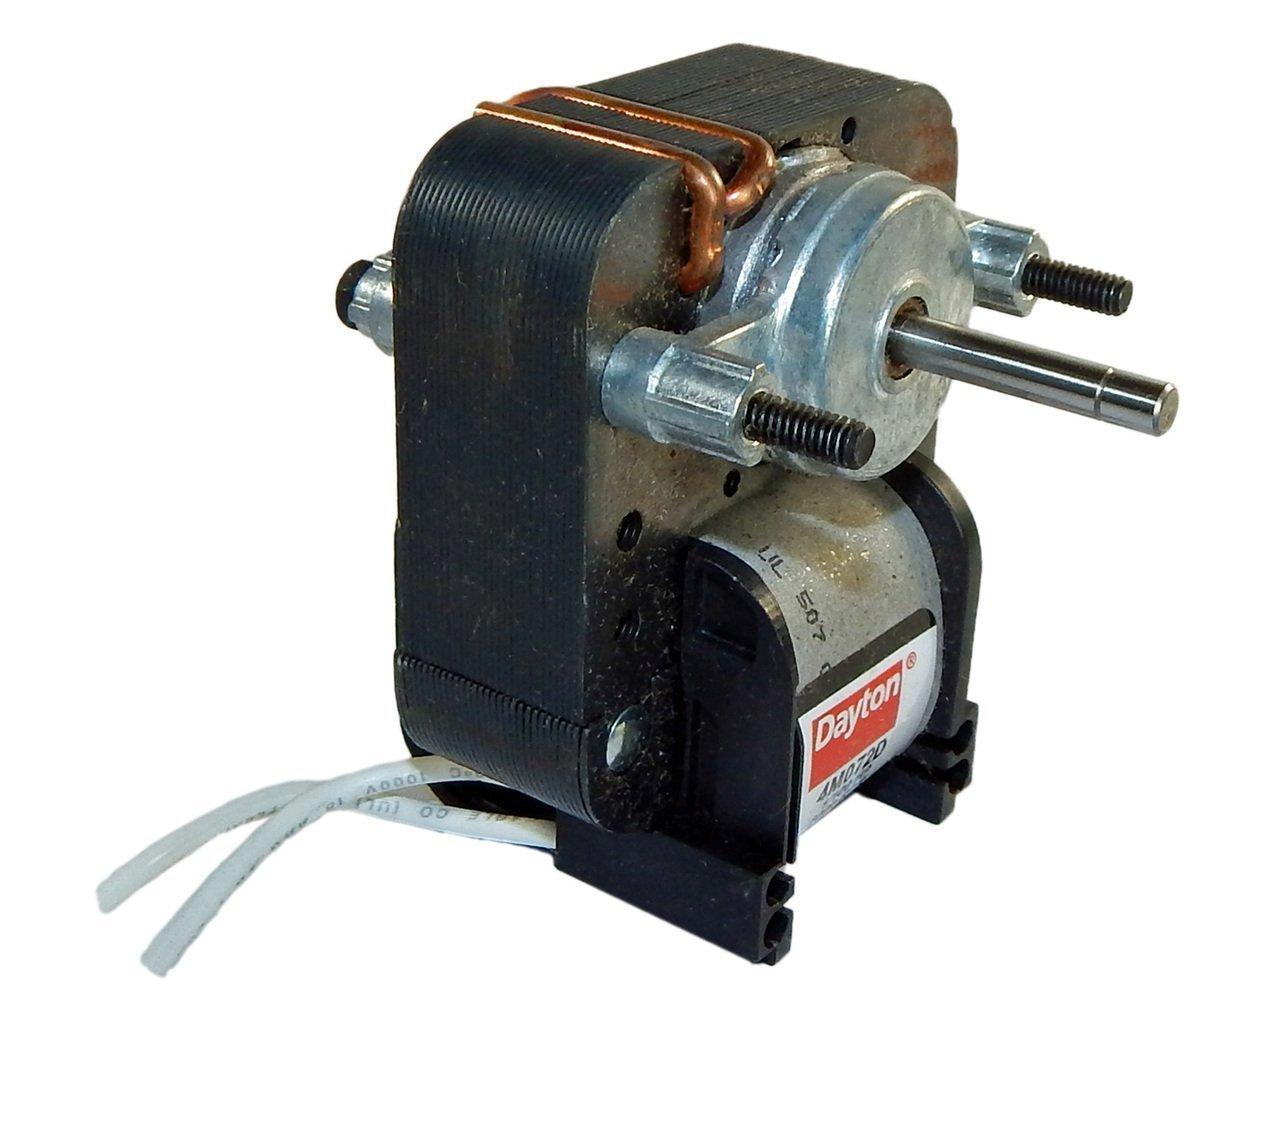 Dayton 4M072 C-Frame Motor, 1'' L, Stud/Hole, CWSE